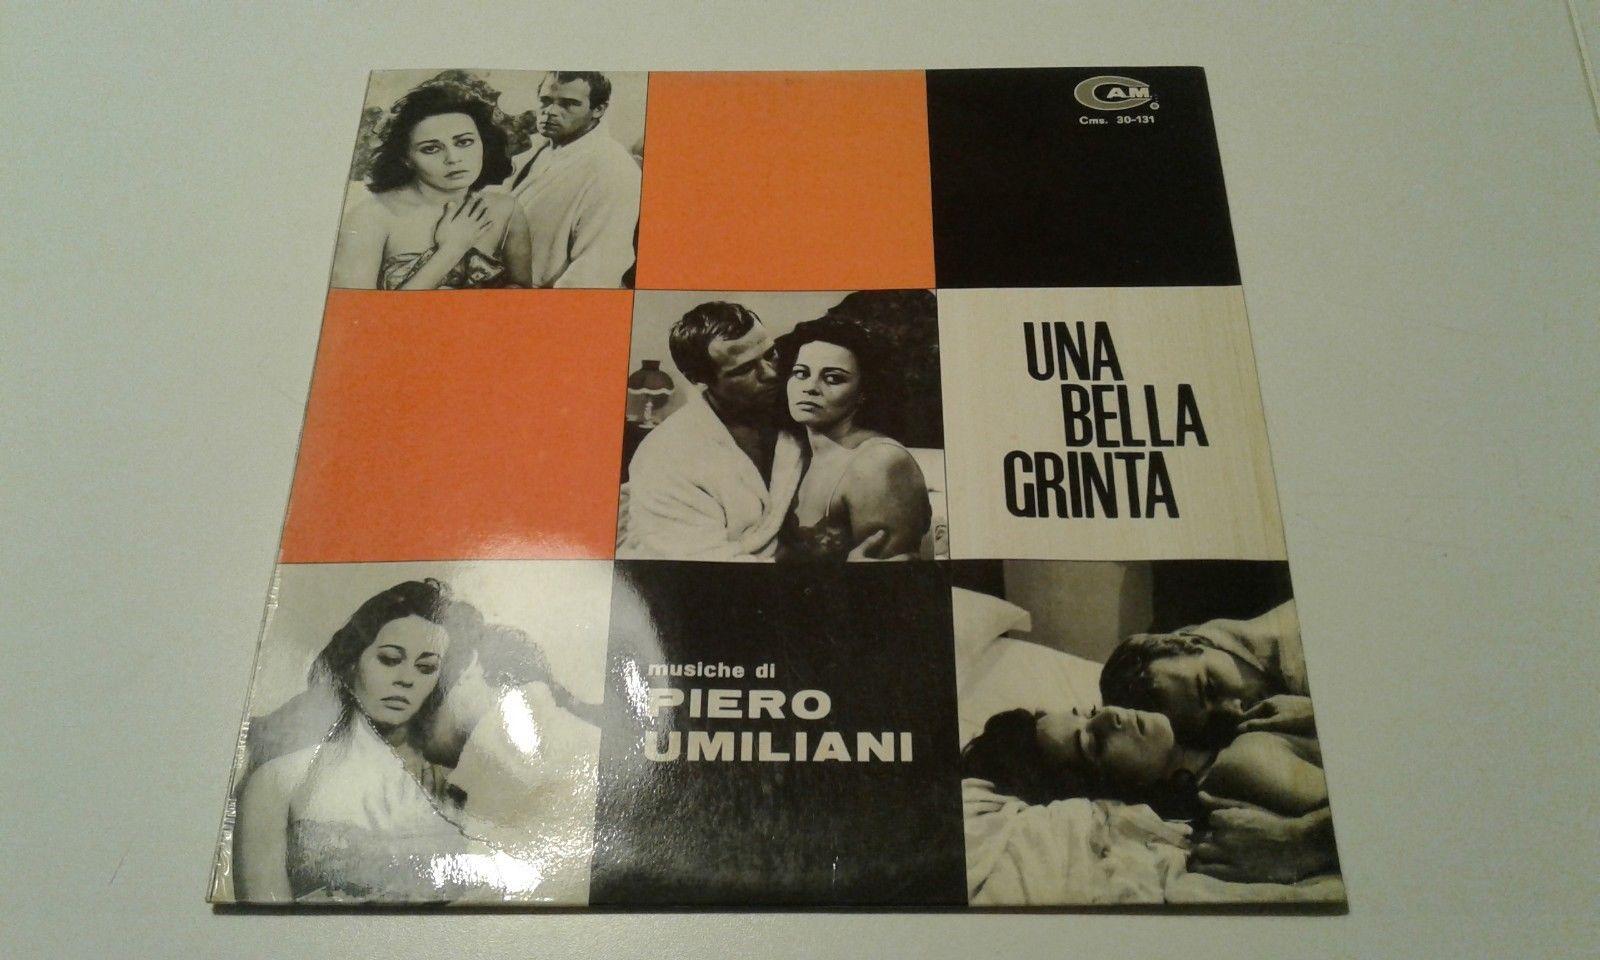 LP - PIERO UMILIANI - UNA BELLA GRINTA - CAM CMS 30-131 - ORIGINAL